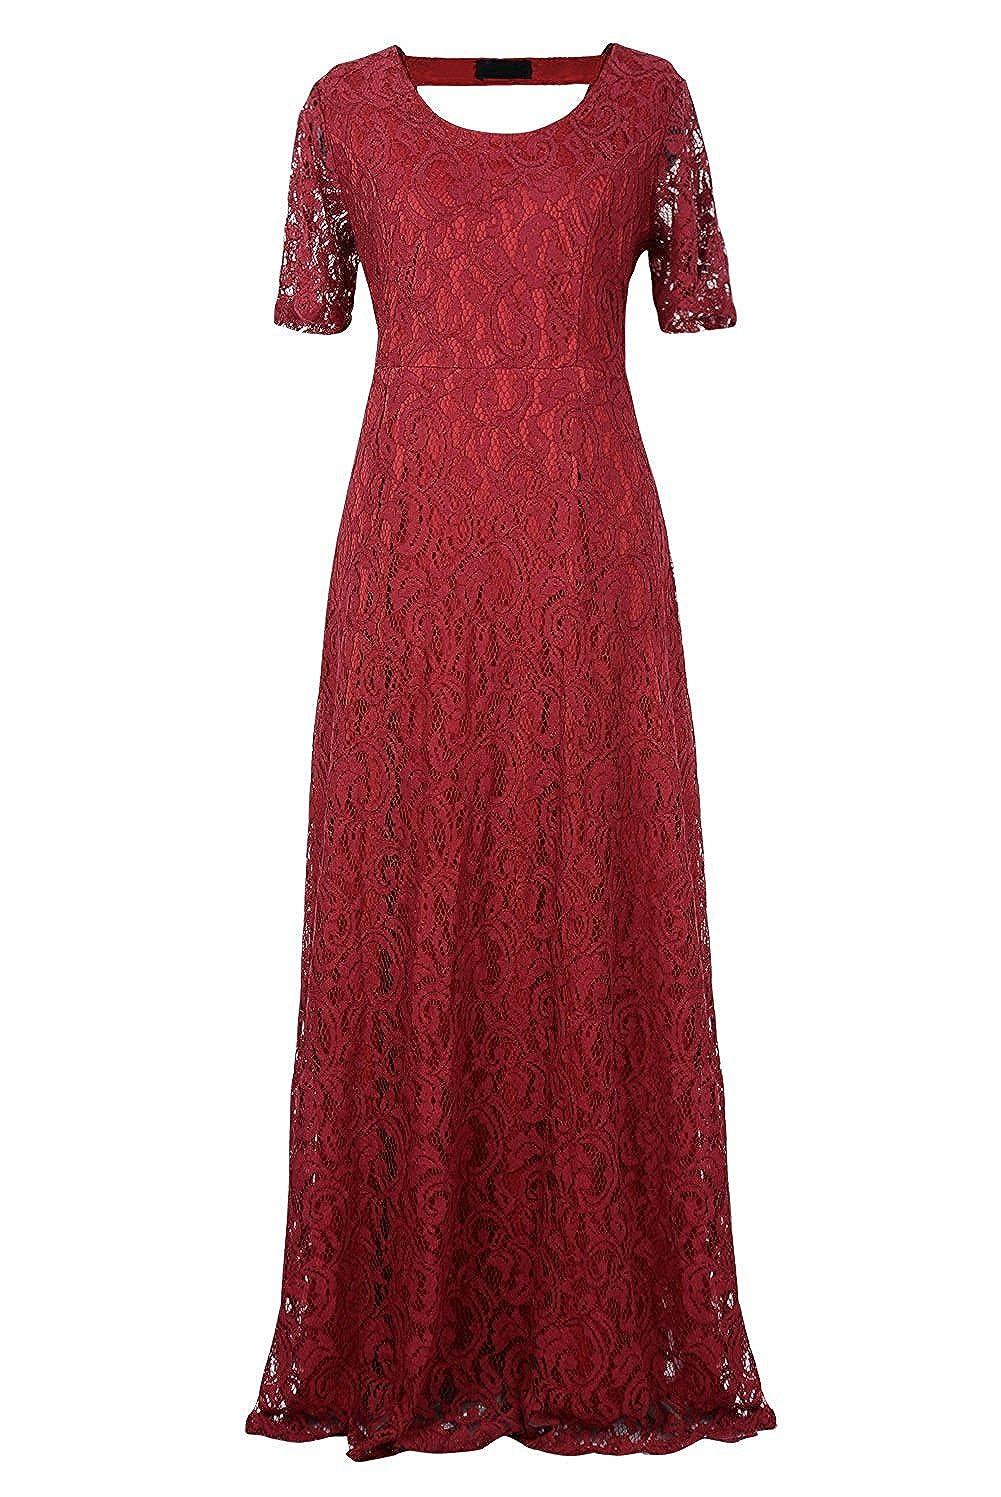 C2U Apprael ReachMe Womens Plus Size Full Lace Wedding Maxi Dress Elegant Gown Party Dresses